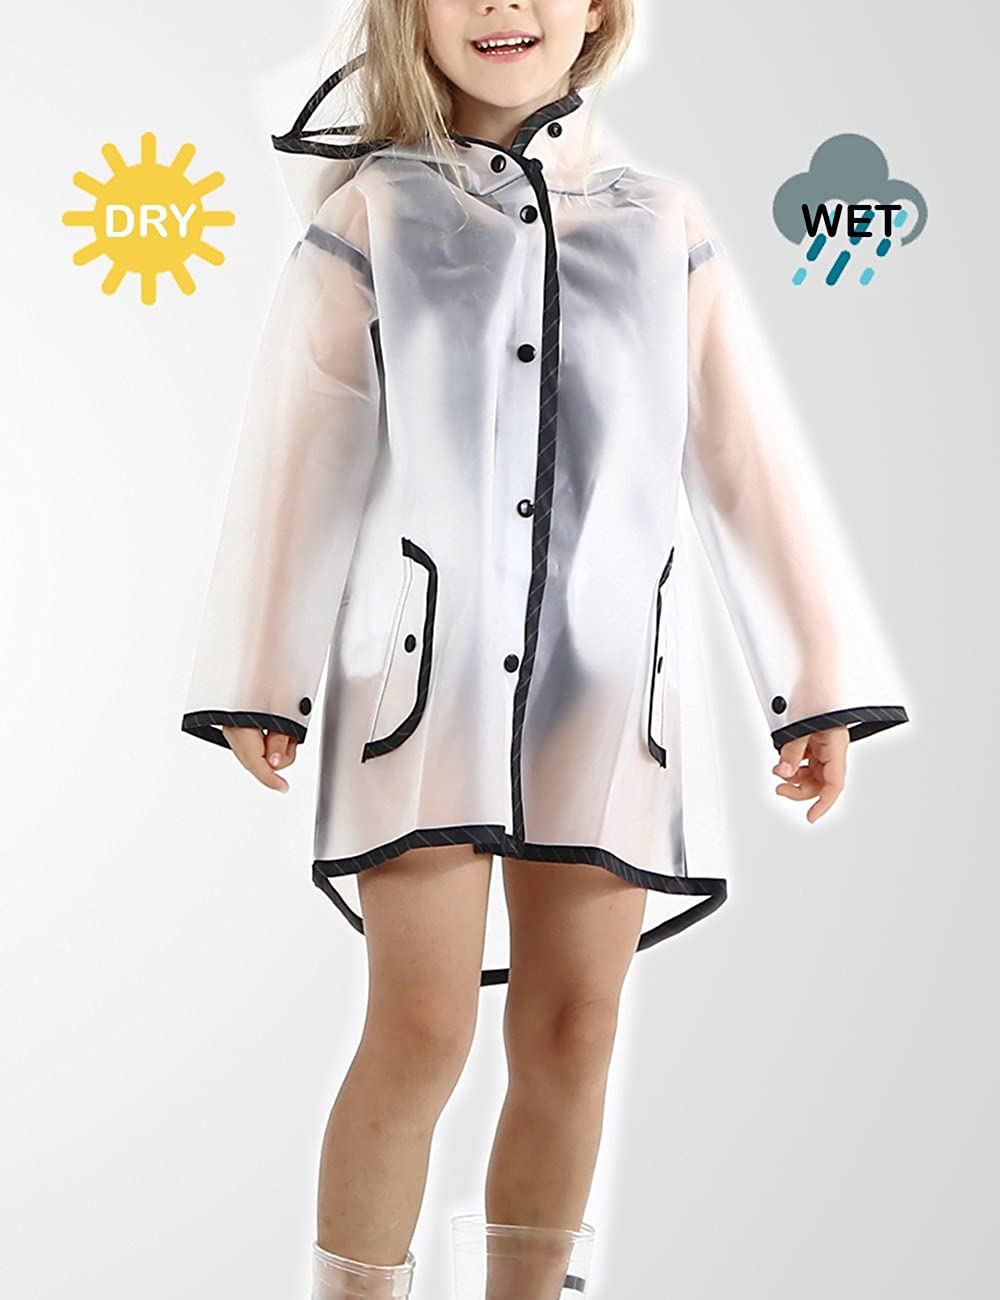 ITSMN Kids Girl Waterproof Hooded Rain Jacket Raincoat Lightweight Poncho Outdoor EVA Black